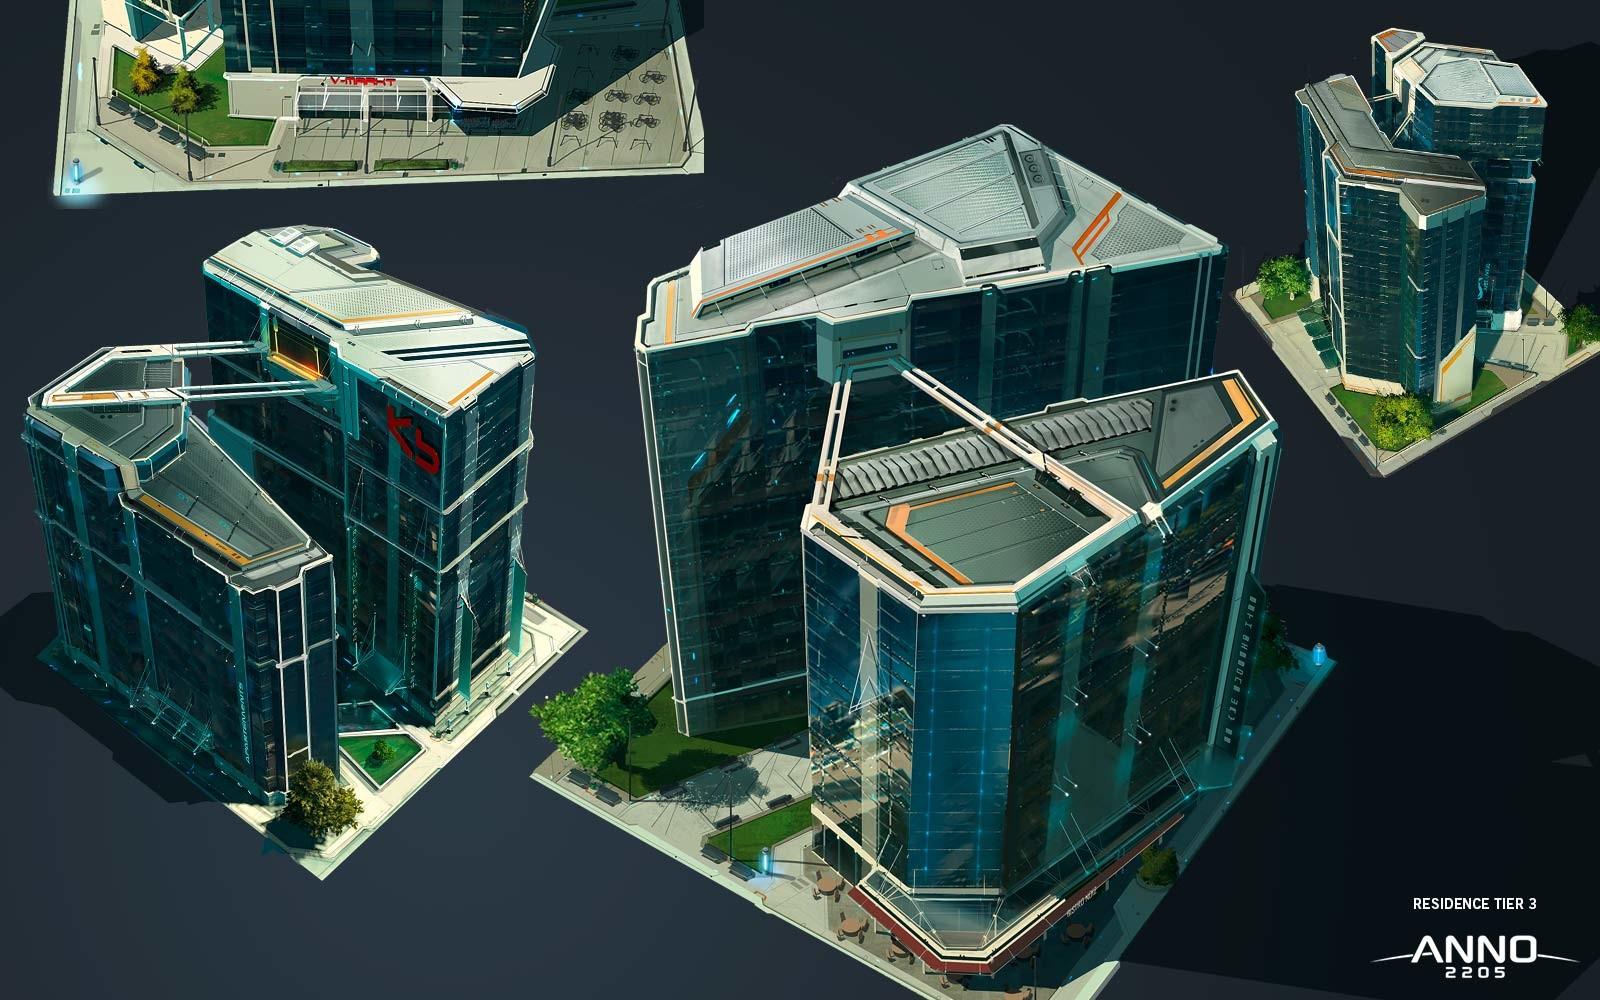 Artstation anno 2205 residence building s ren meding for Anno 2070 find architect